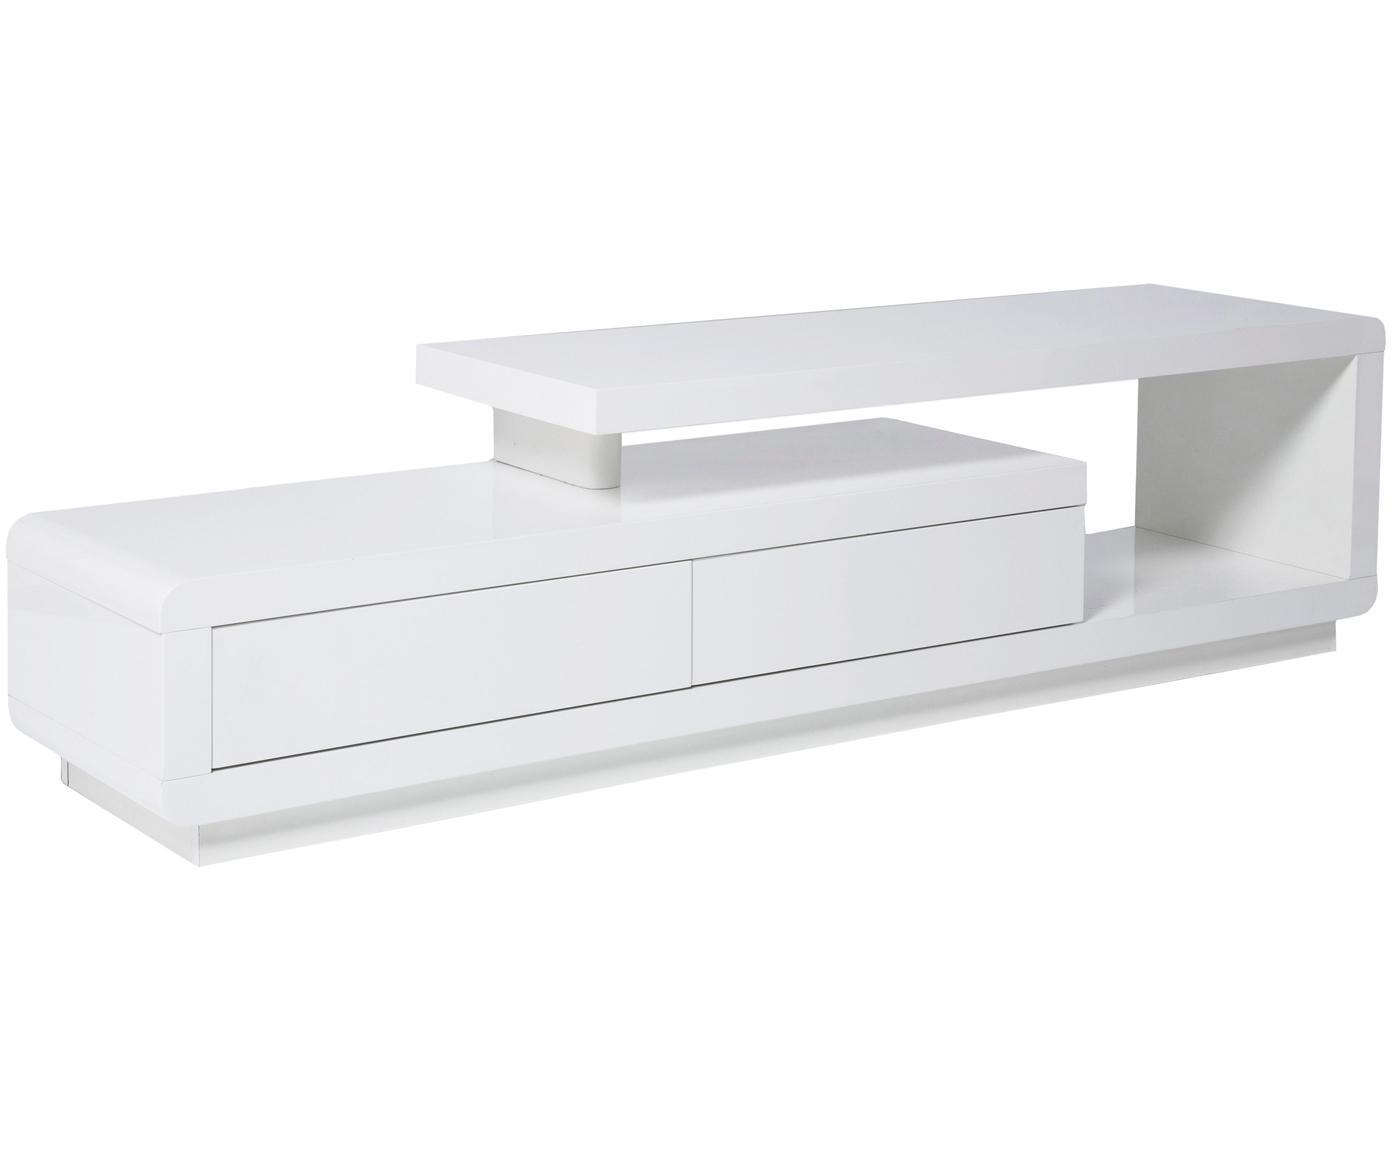 Mueble TV Loft, Tablero de fibras de densidad media(MDF), pintado, Blanco, An 170 x F 40 cm